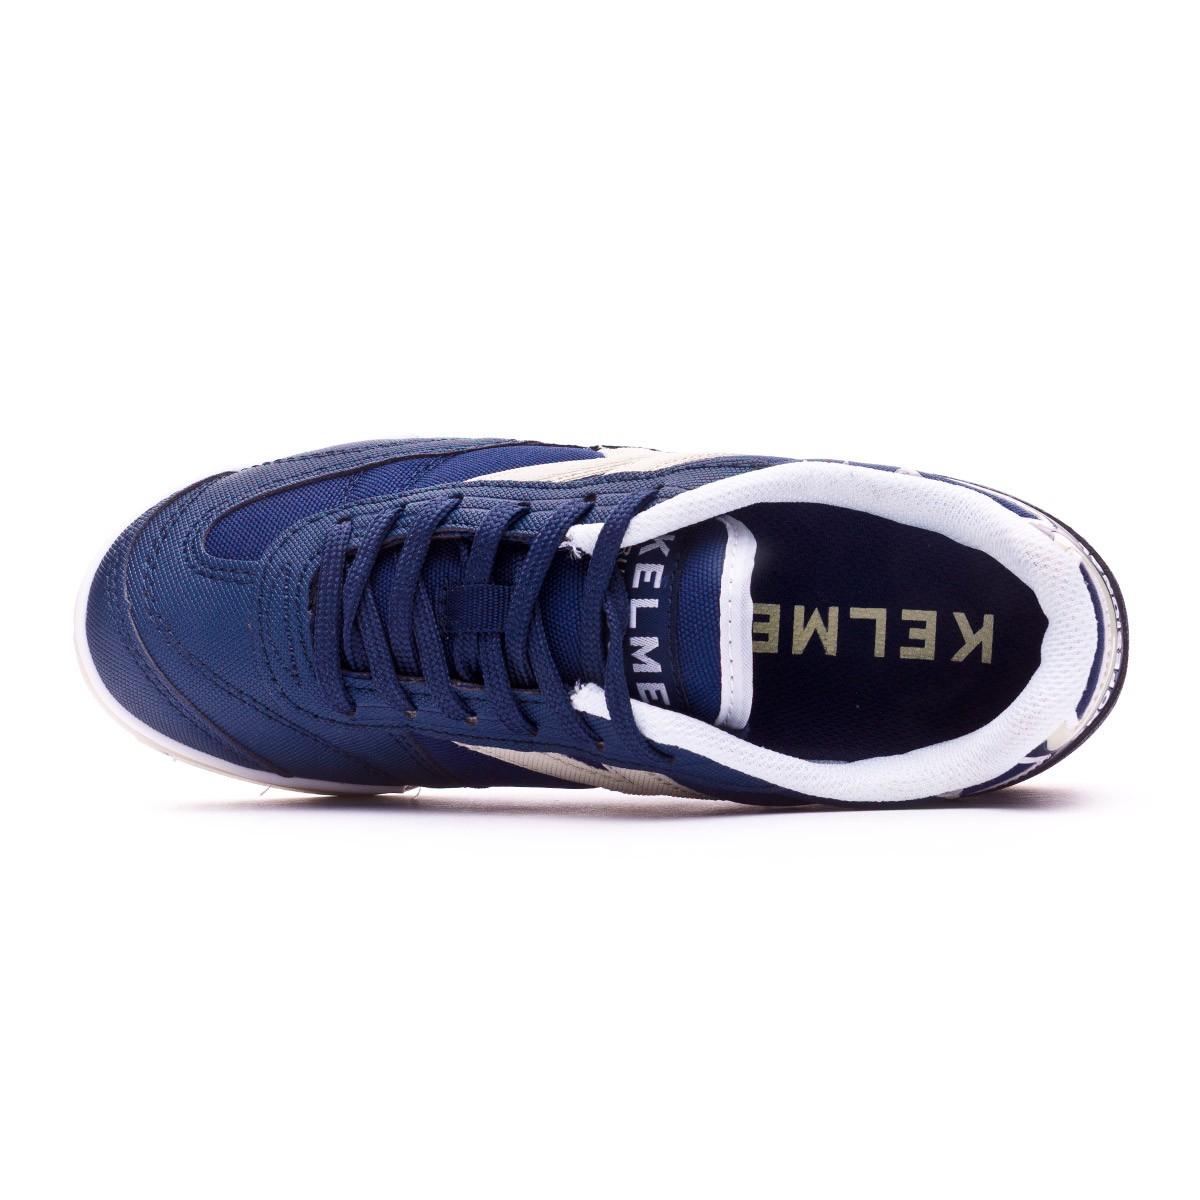 9e6cc482965 Futsal Boot Kelme Kids Trueno Sala 2.0 Navy blue-White - Football store  Fútbol Emotion